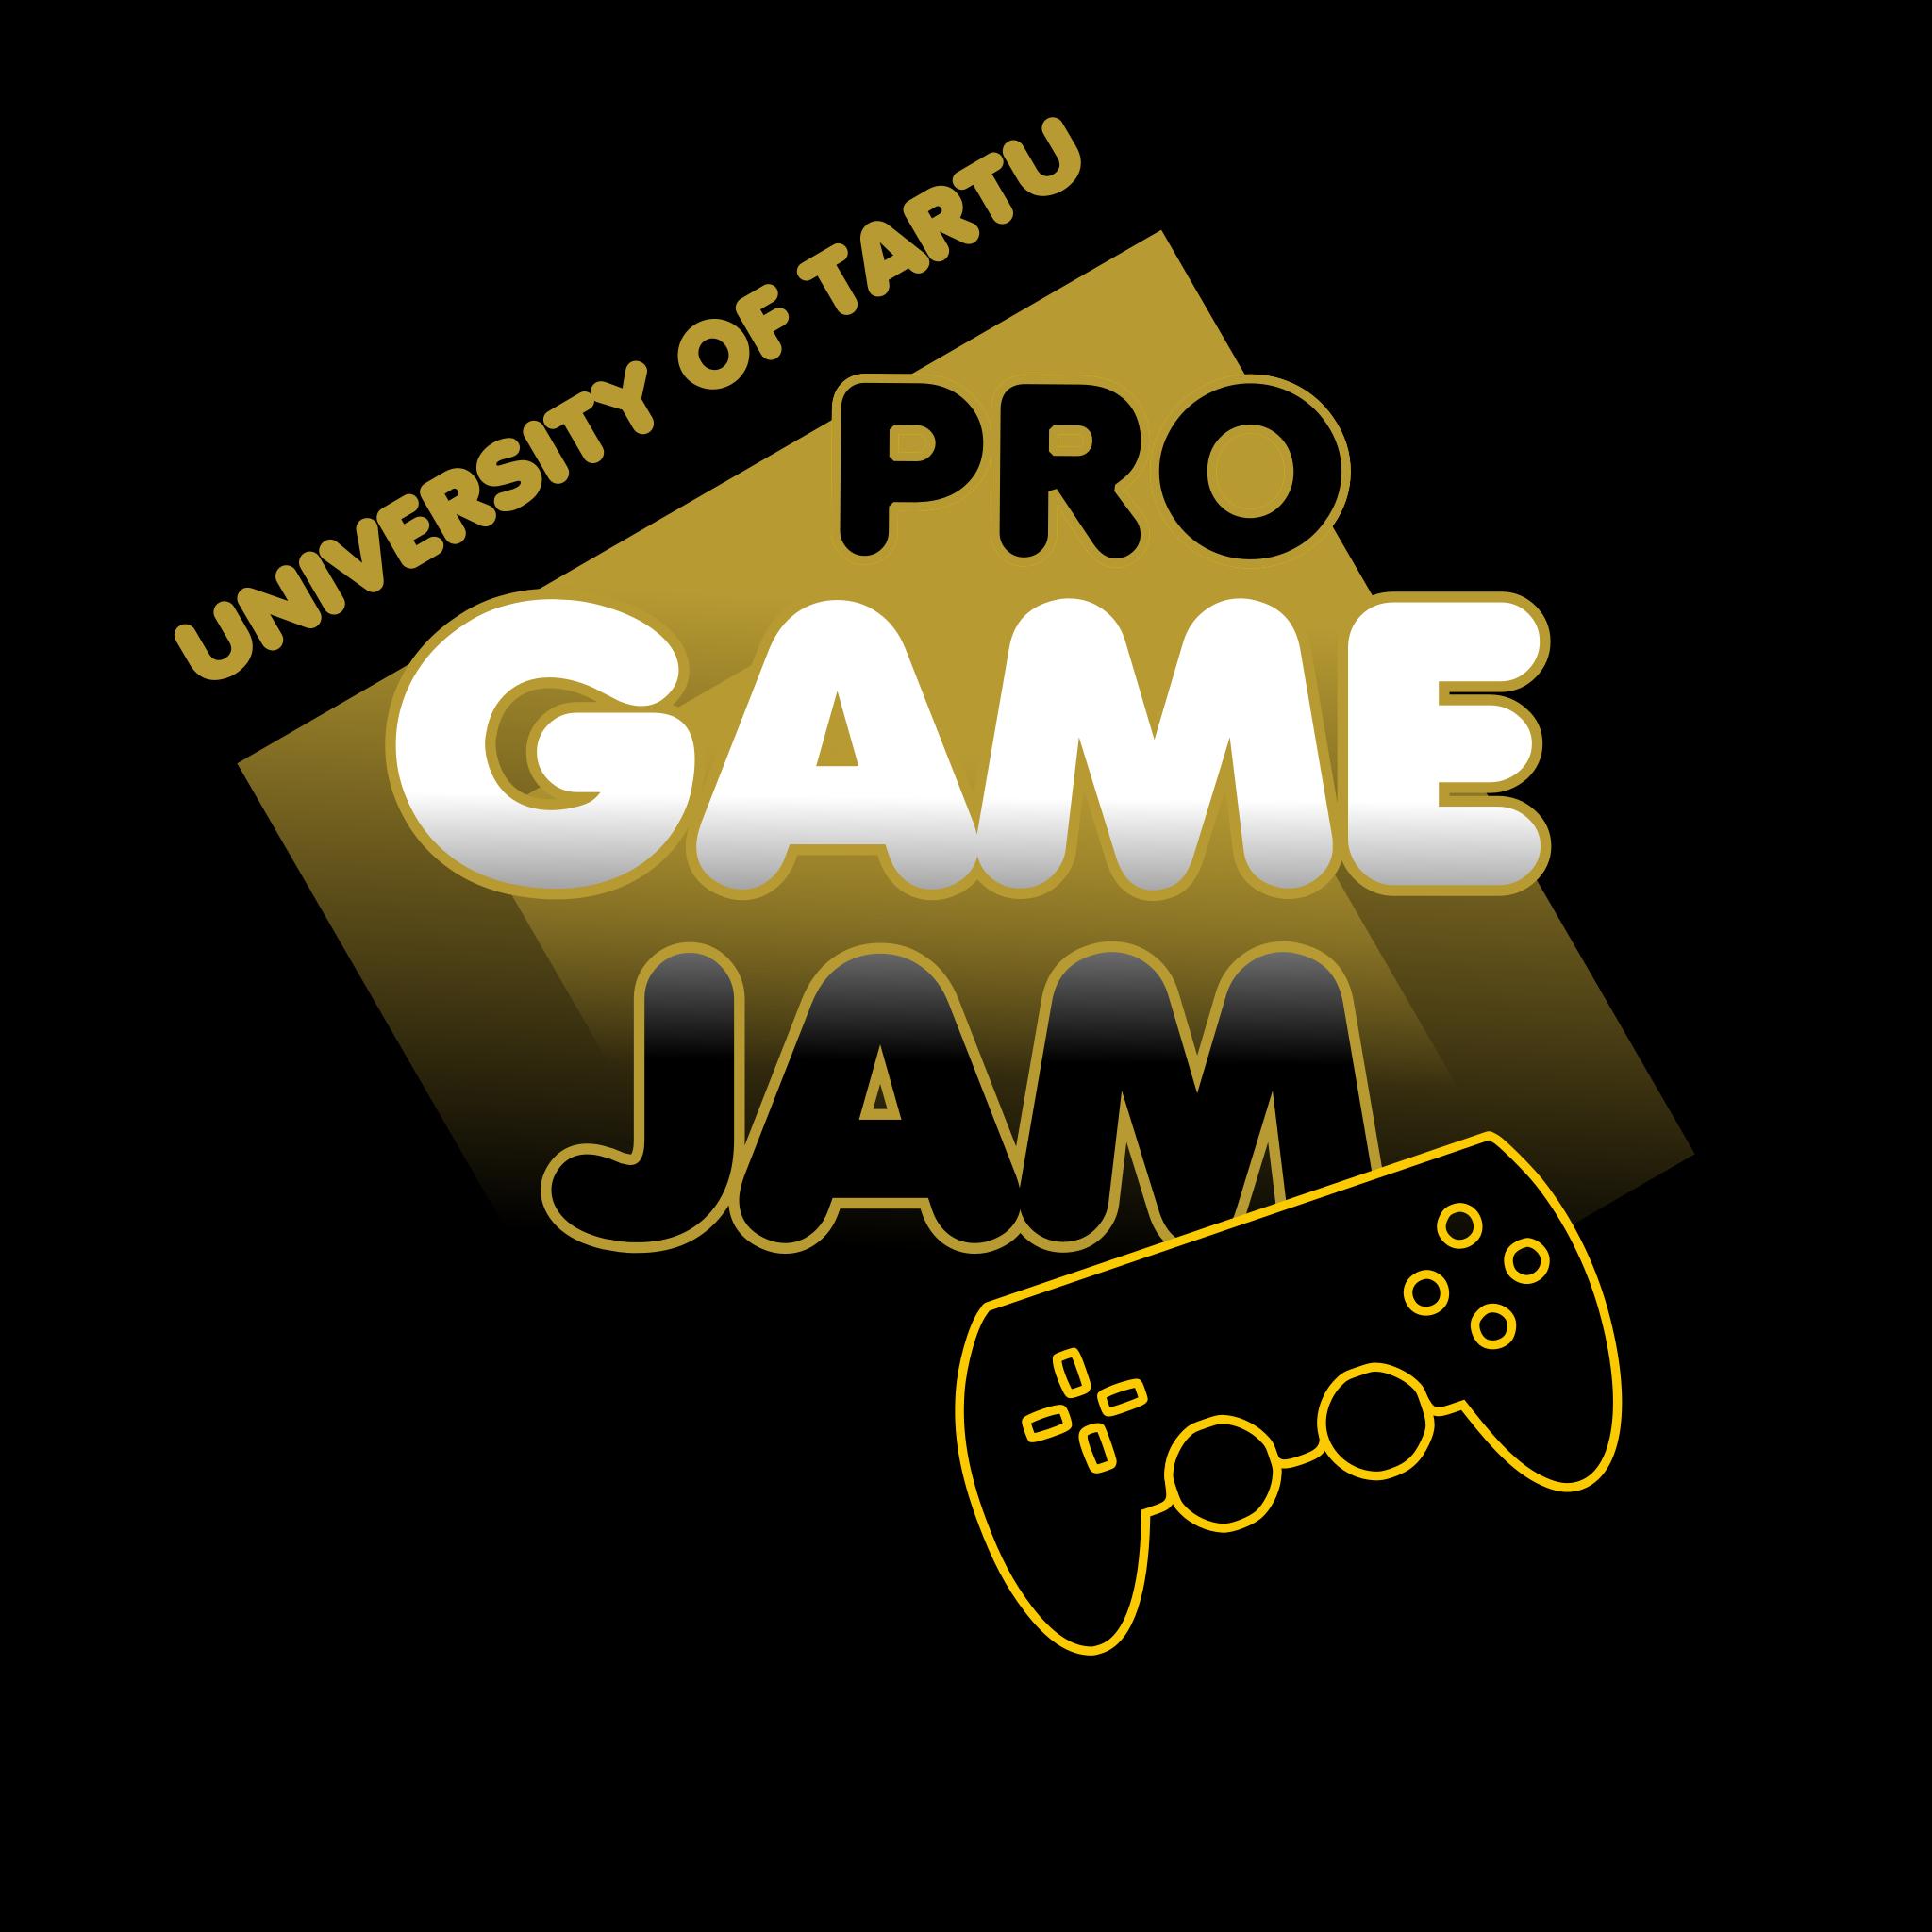 Pro Game Jam